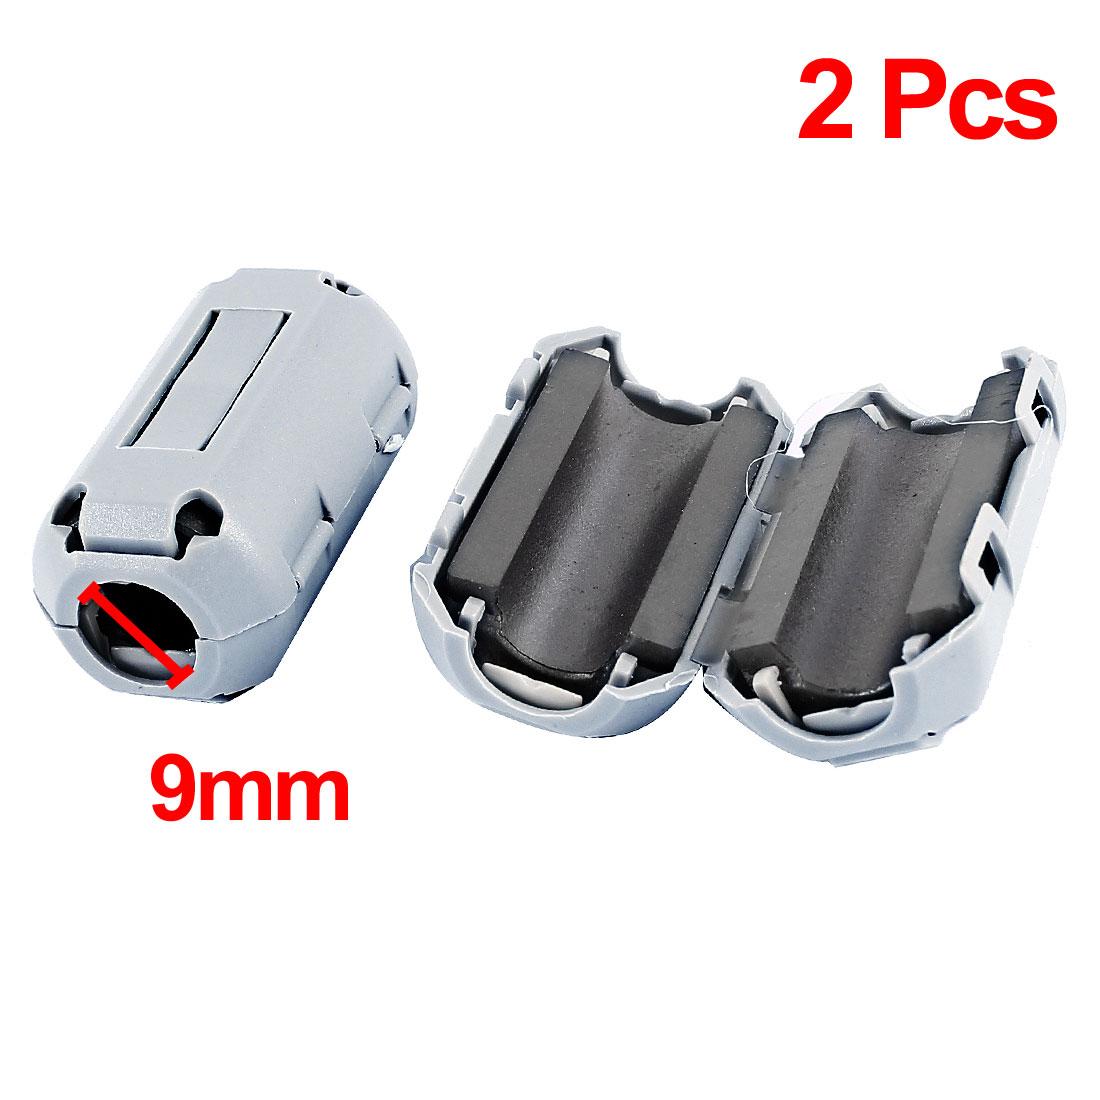 2Pcs 9mm Cable Hole Dia Clip On UF90B Ferrite Core Cable EMI Noise Suppressor Ring Filter Gray